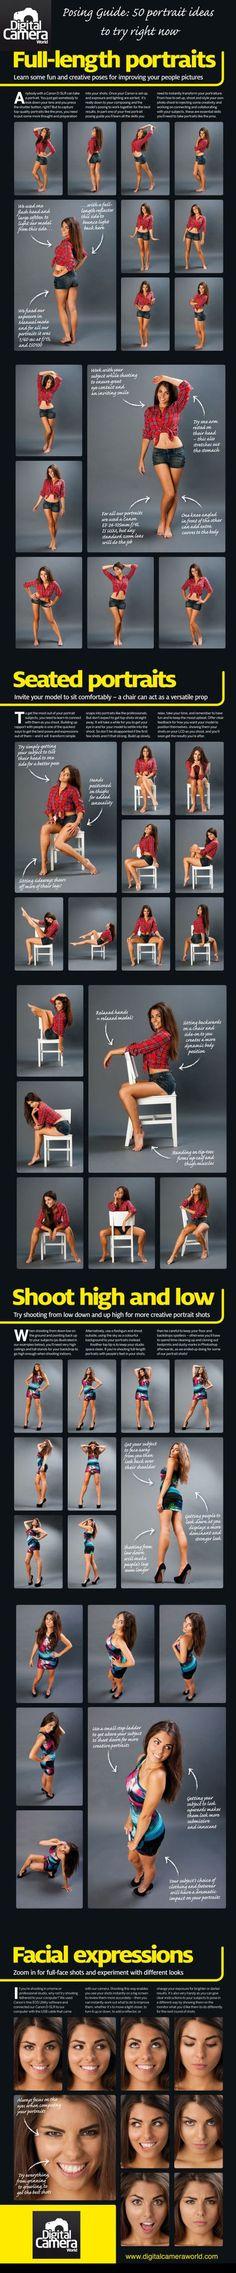 50 Portrait Photography Ideas   Infographic - UltraLinx